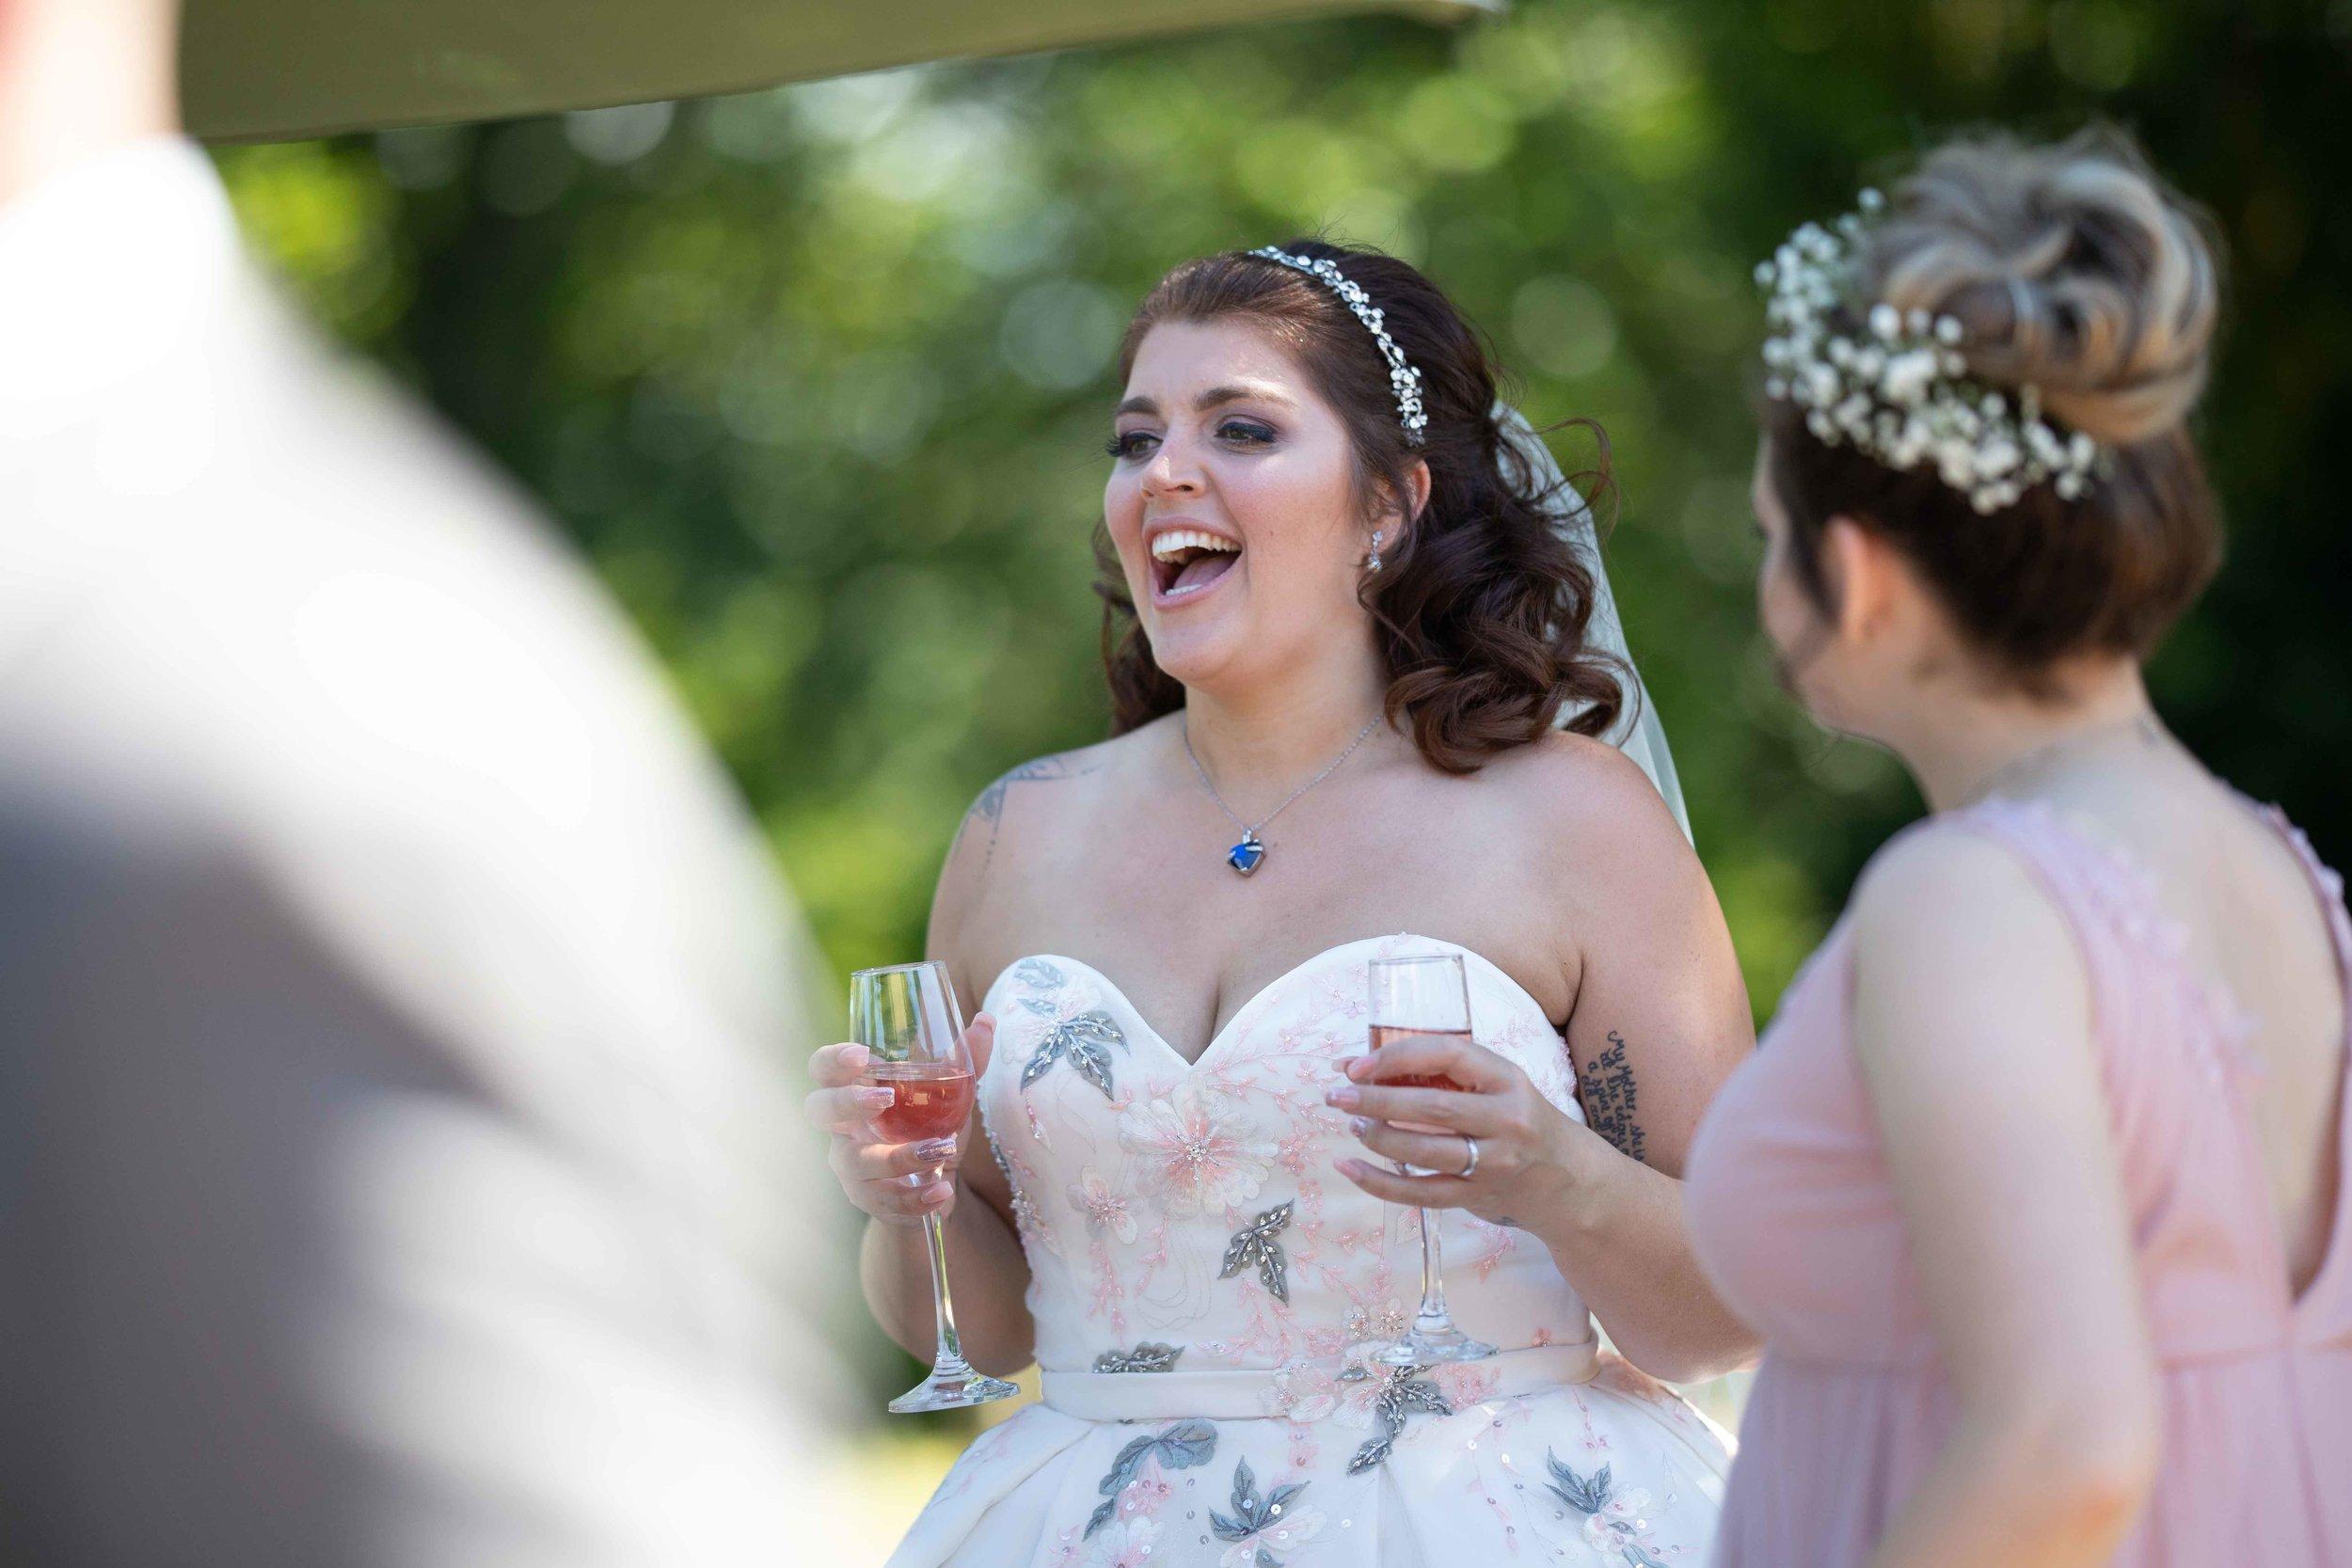 Lea-cooper-photography-wedding-photography-wolverhampton-patshull-park-hotel-wedding-pattingham-wolverhampton-west-midlands-uk-26.JPG